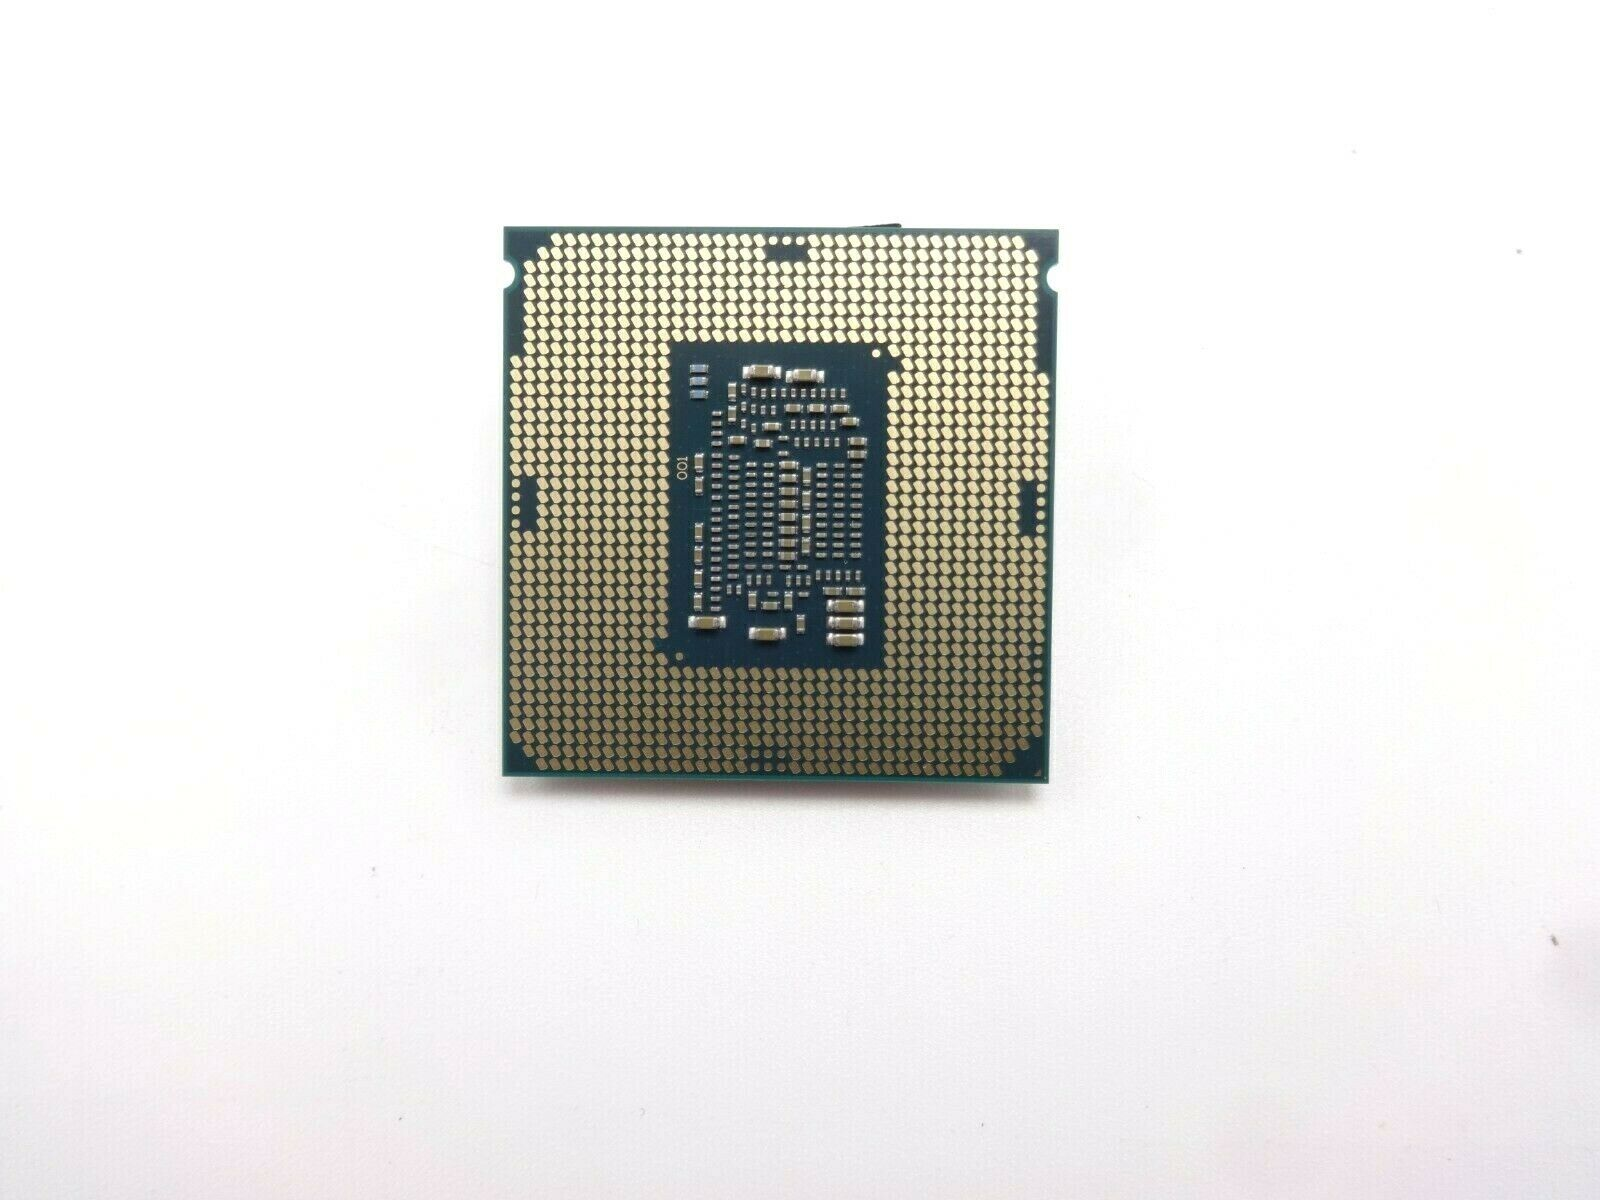 HP ProLiant DL360 G7 Quad Core E5640 SLBVC Processor CPU Upgrade Kit